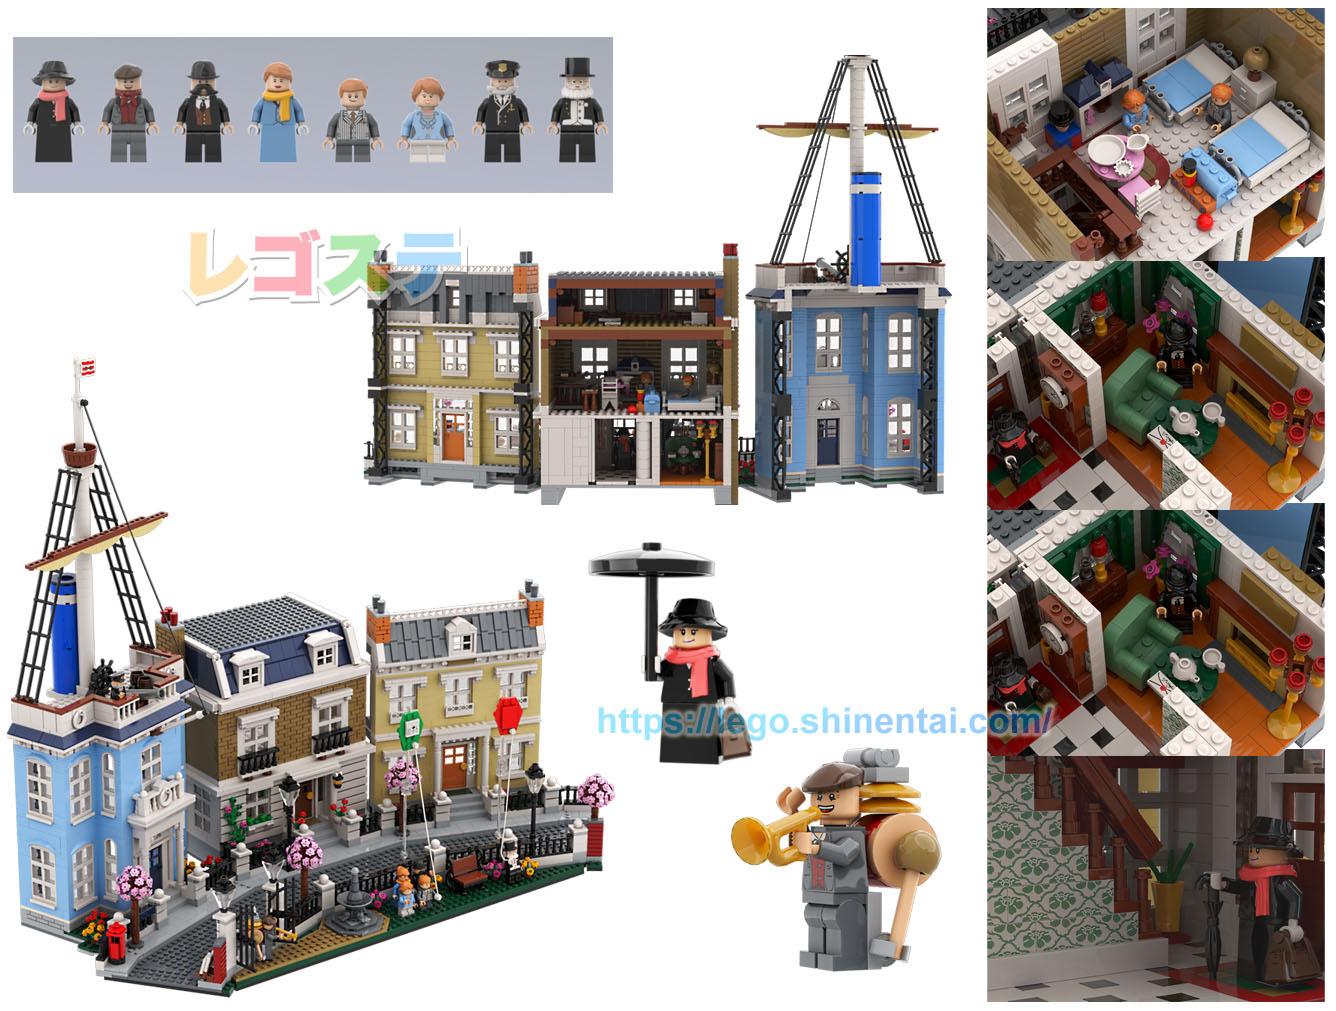 LEGO メリー・ポピンズ桜通り:Mary Poppins, Cherry Tree Lane